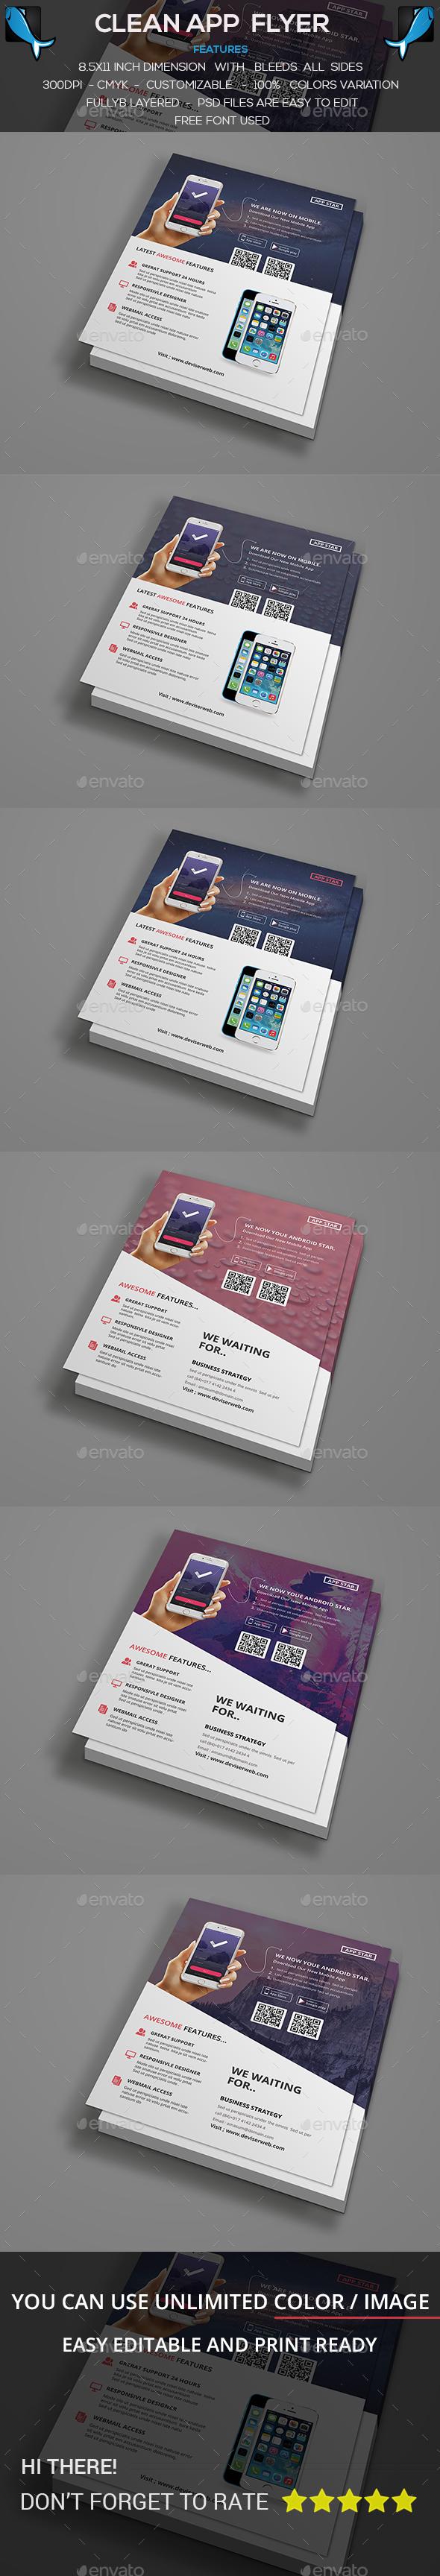 App Flyer Template - Corporate Flyers